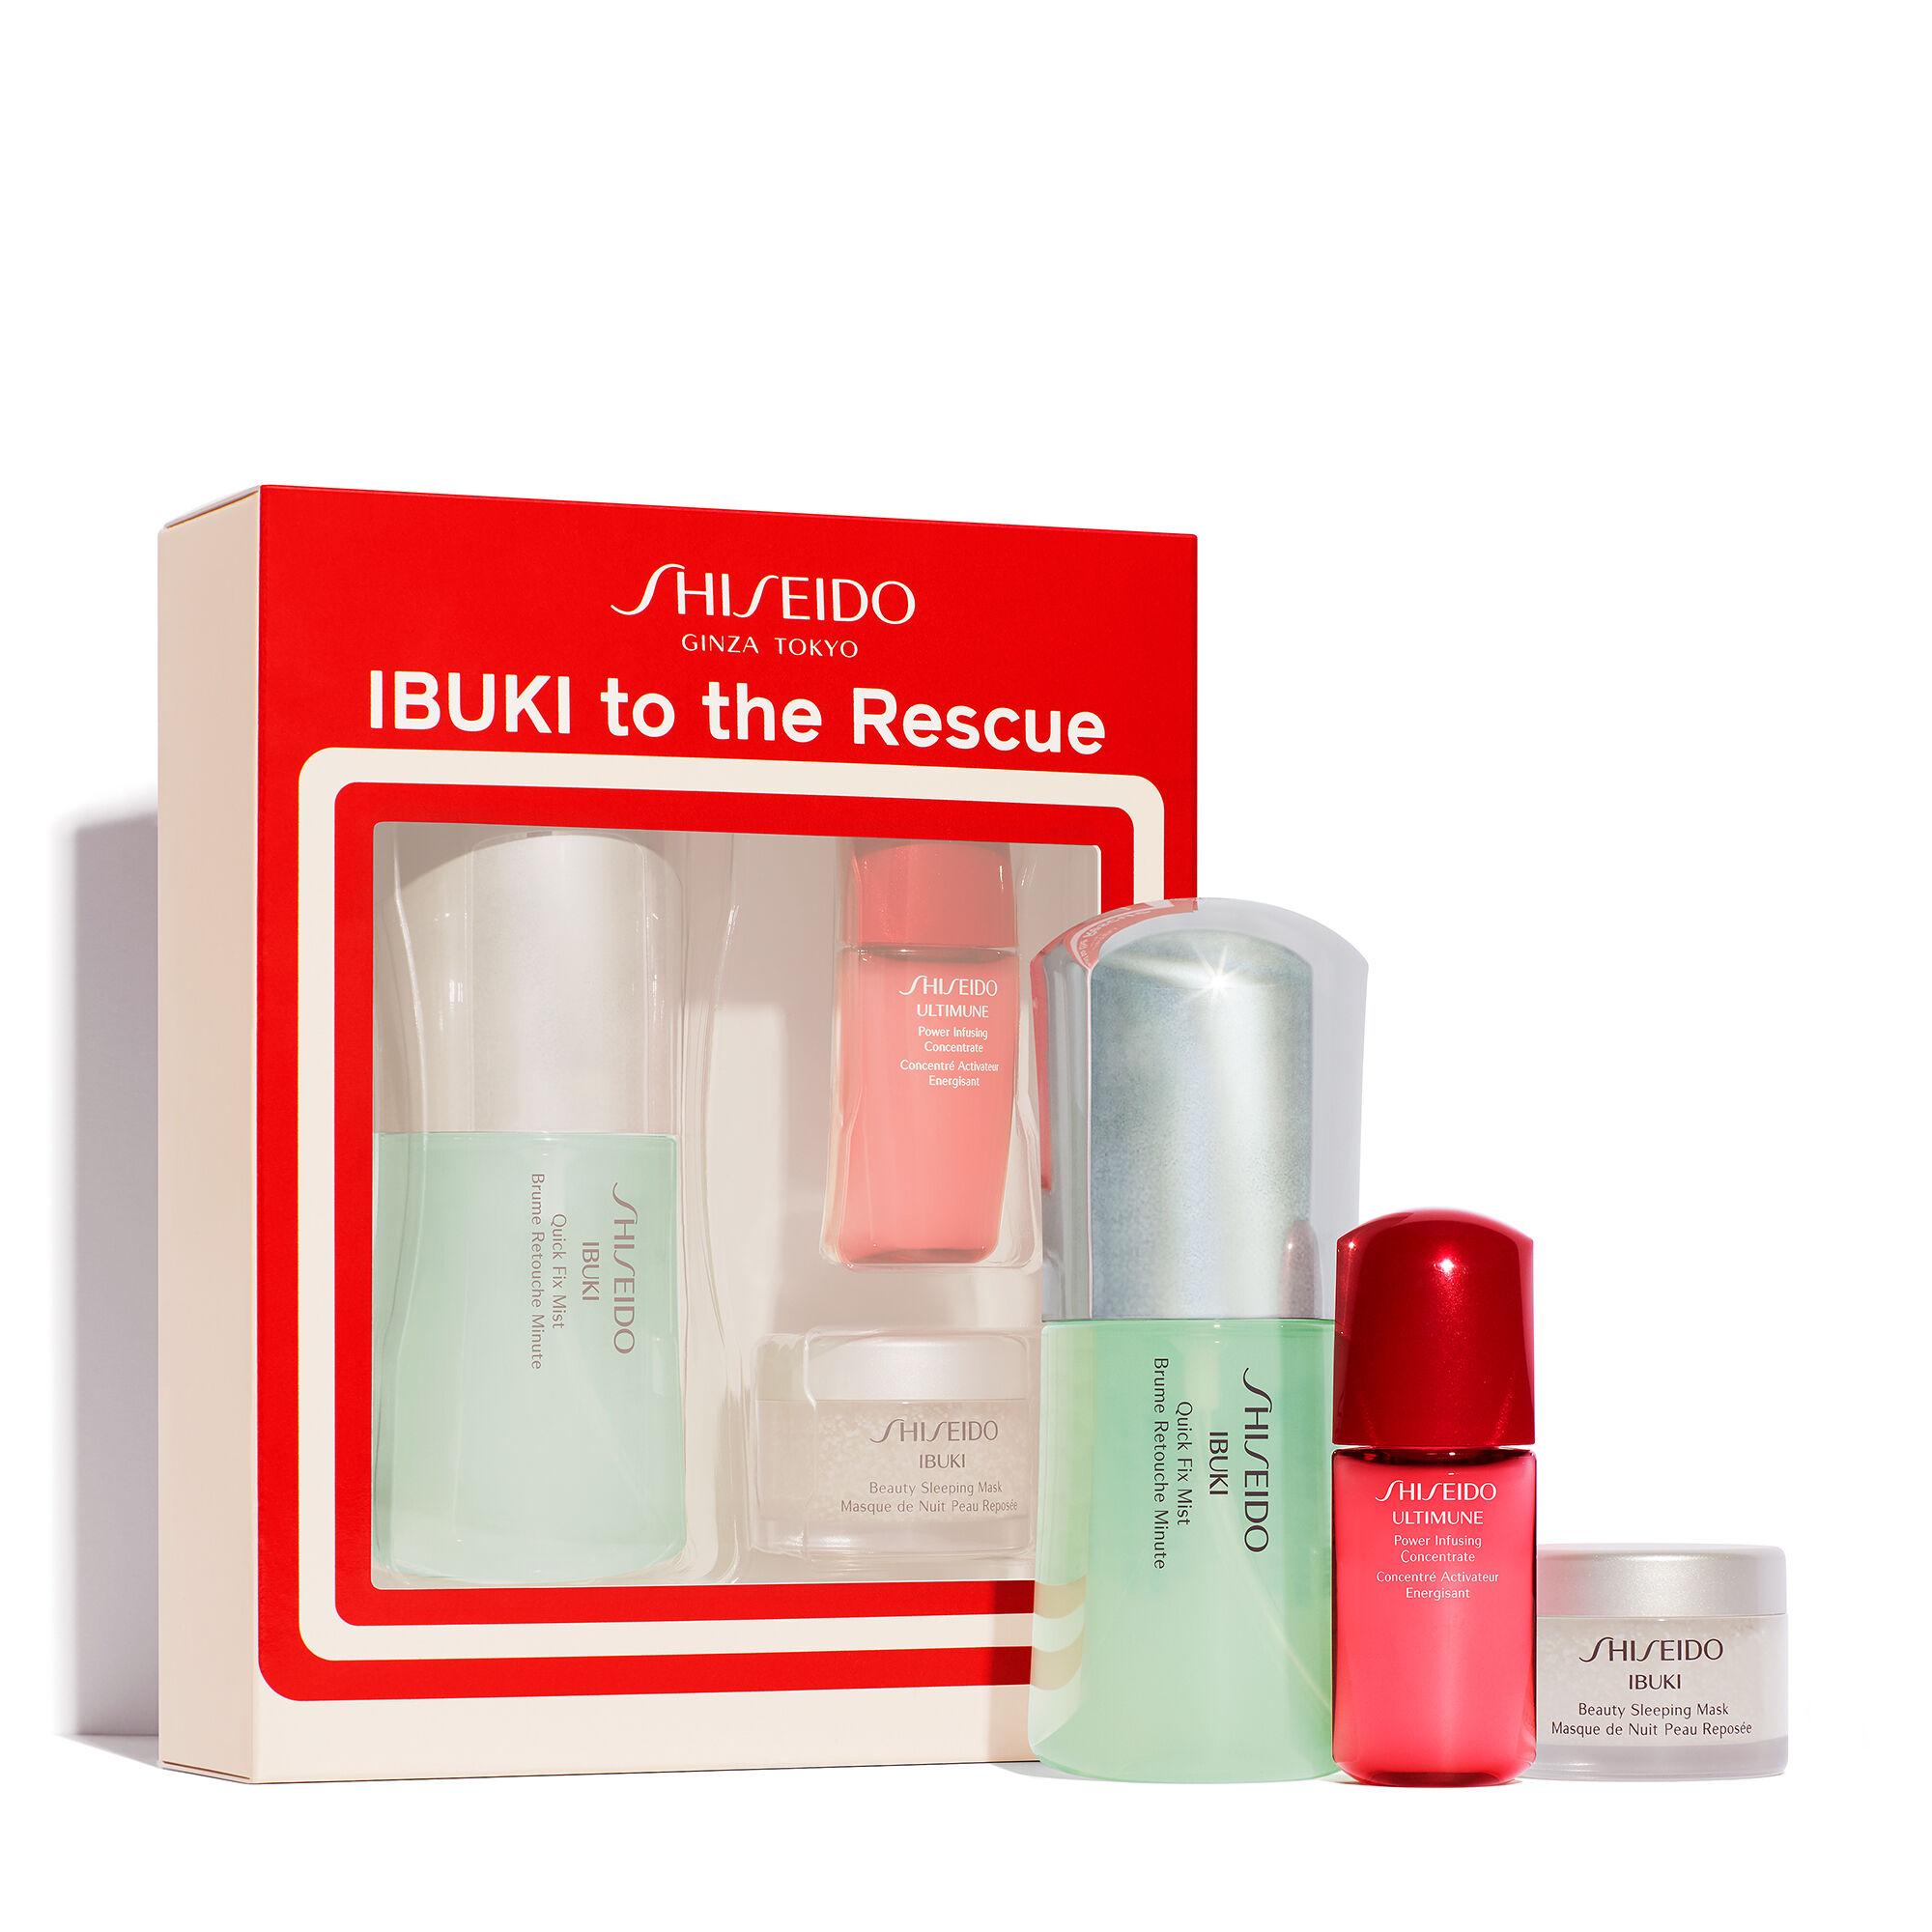 Kit Ibuki to the Rescue (un valor de -$52,